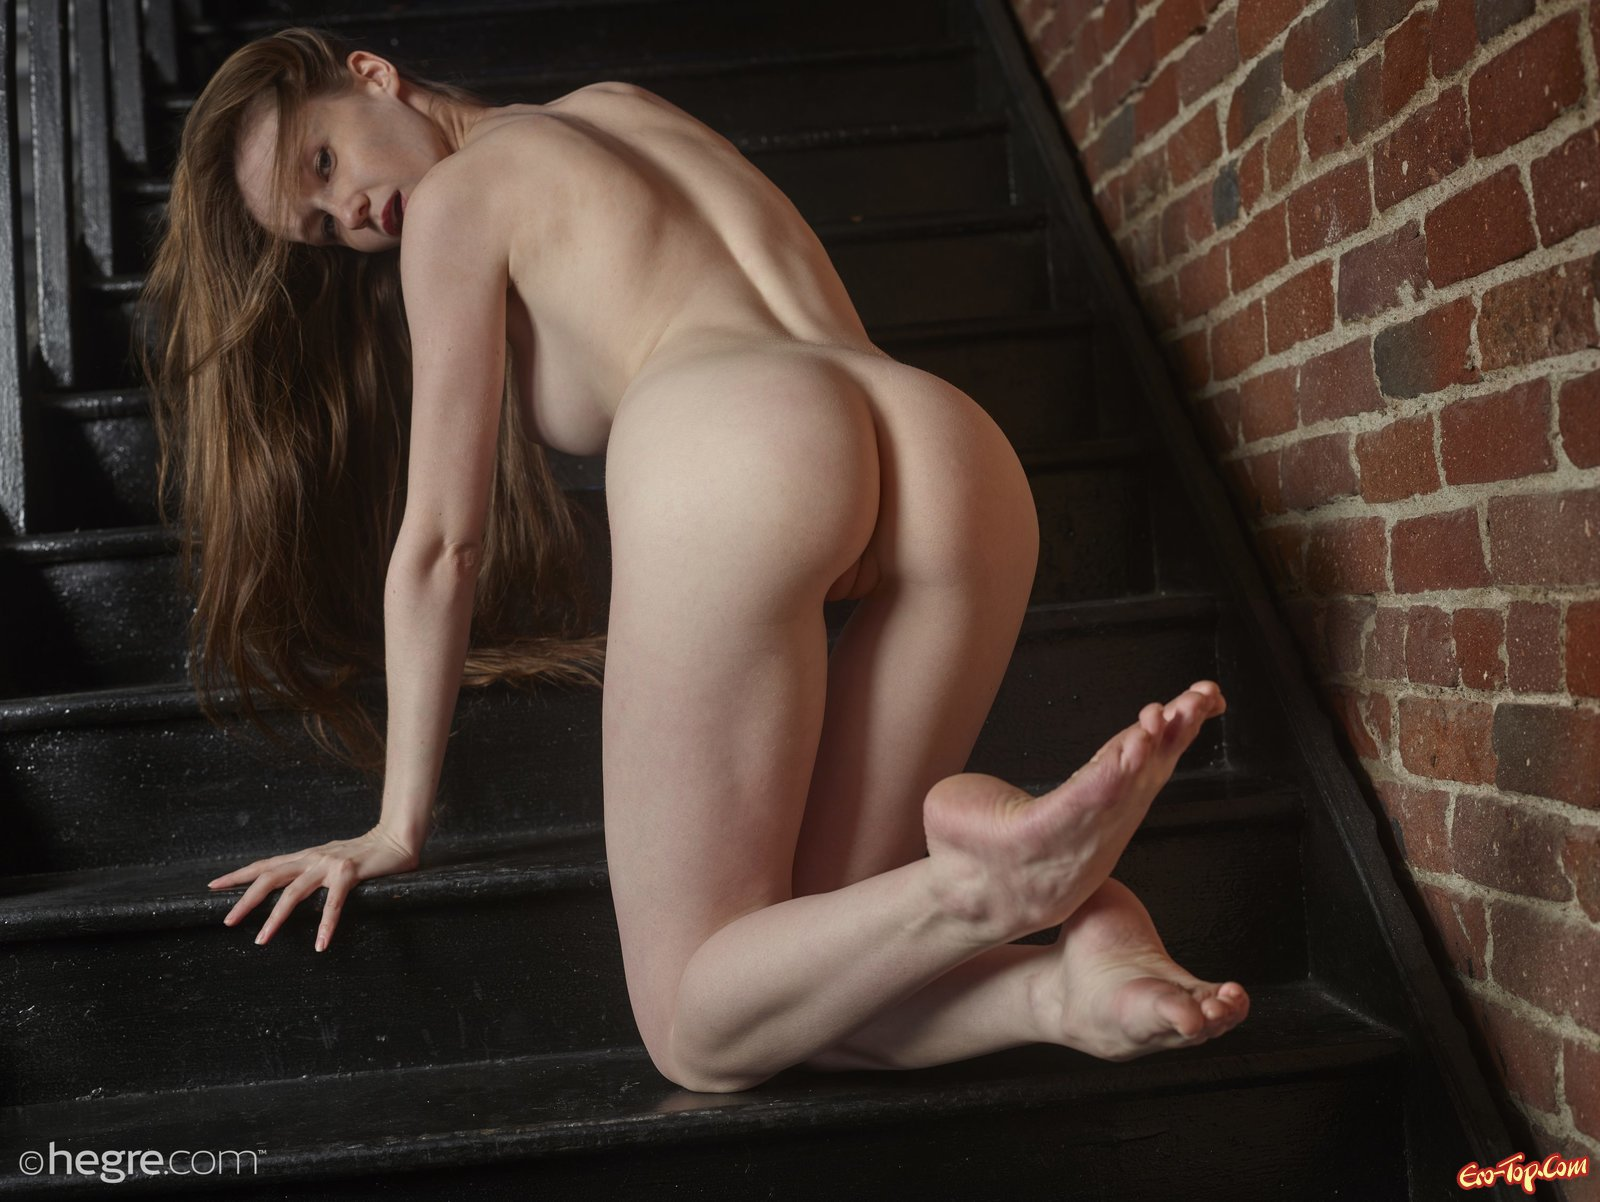 Голая красотка позирует на лестнице